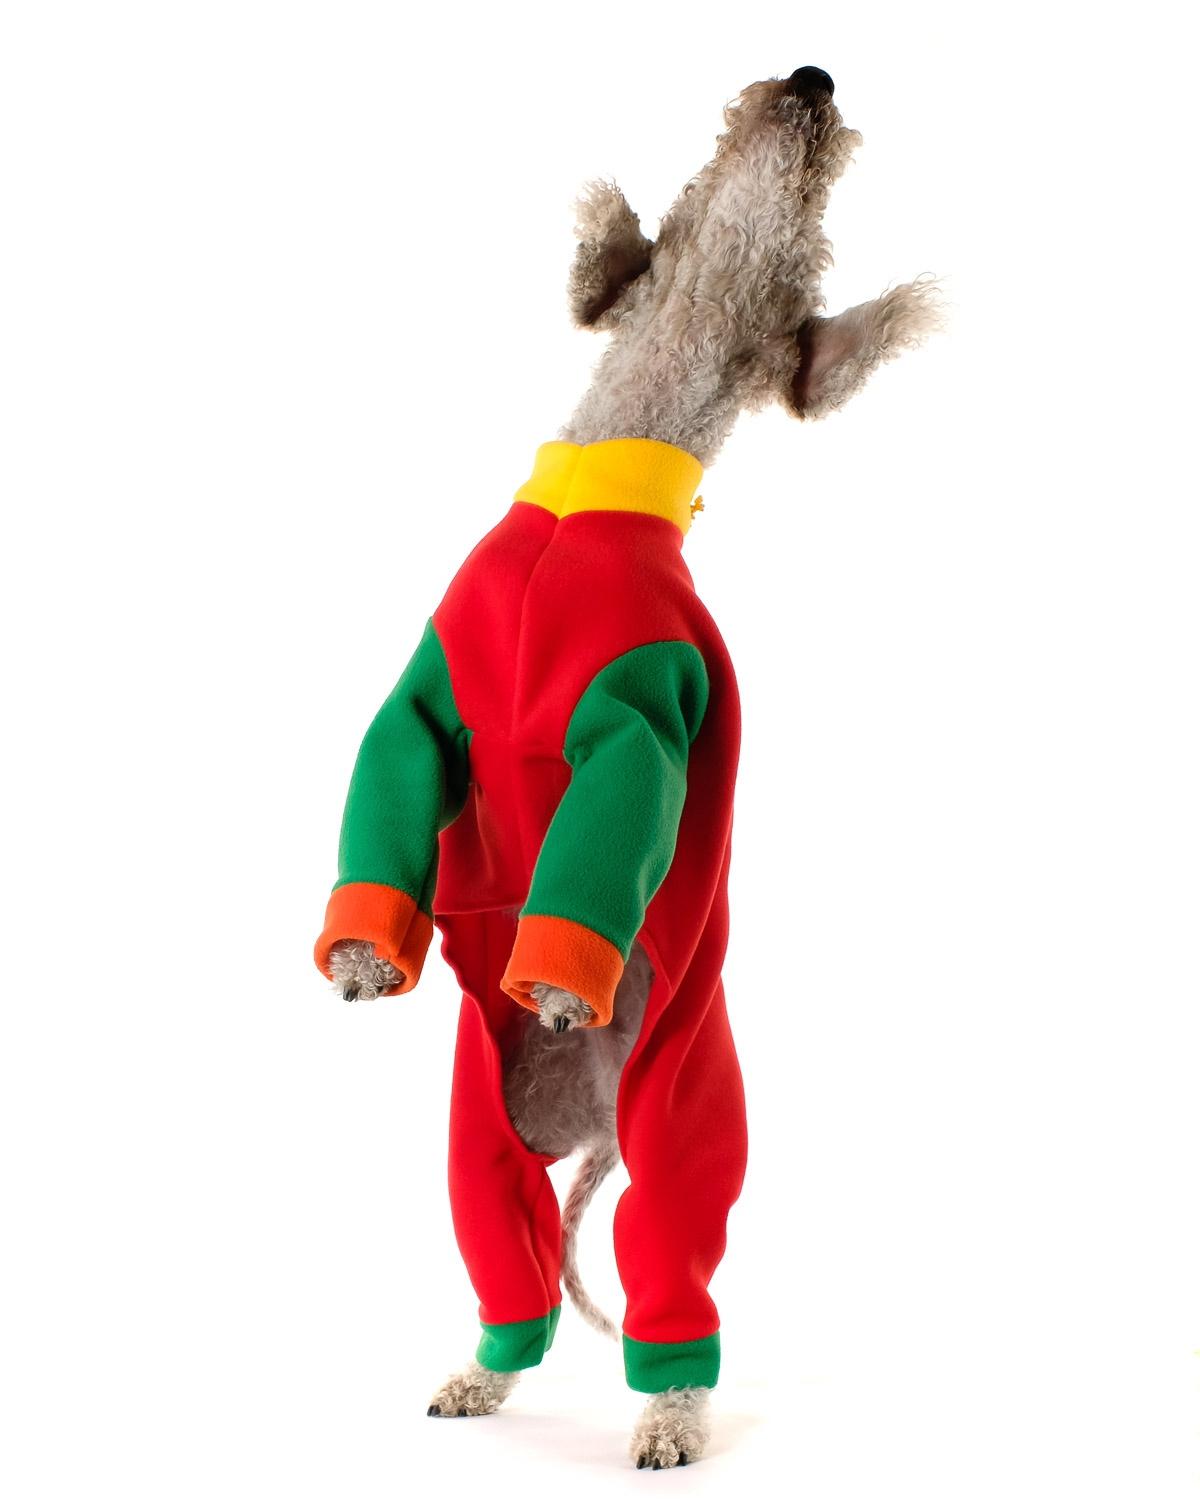 Bedlington Terrier in colourful costume